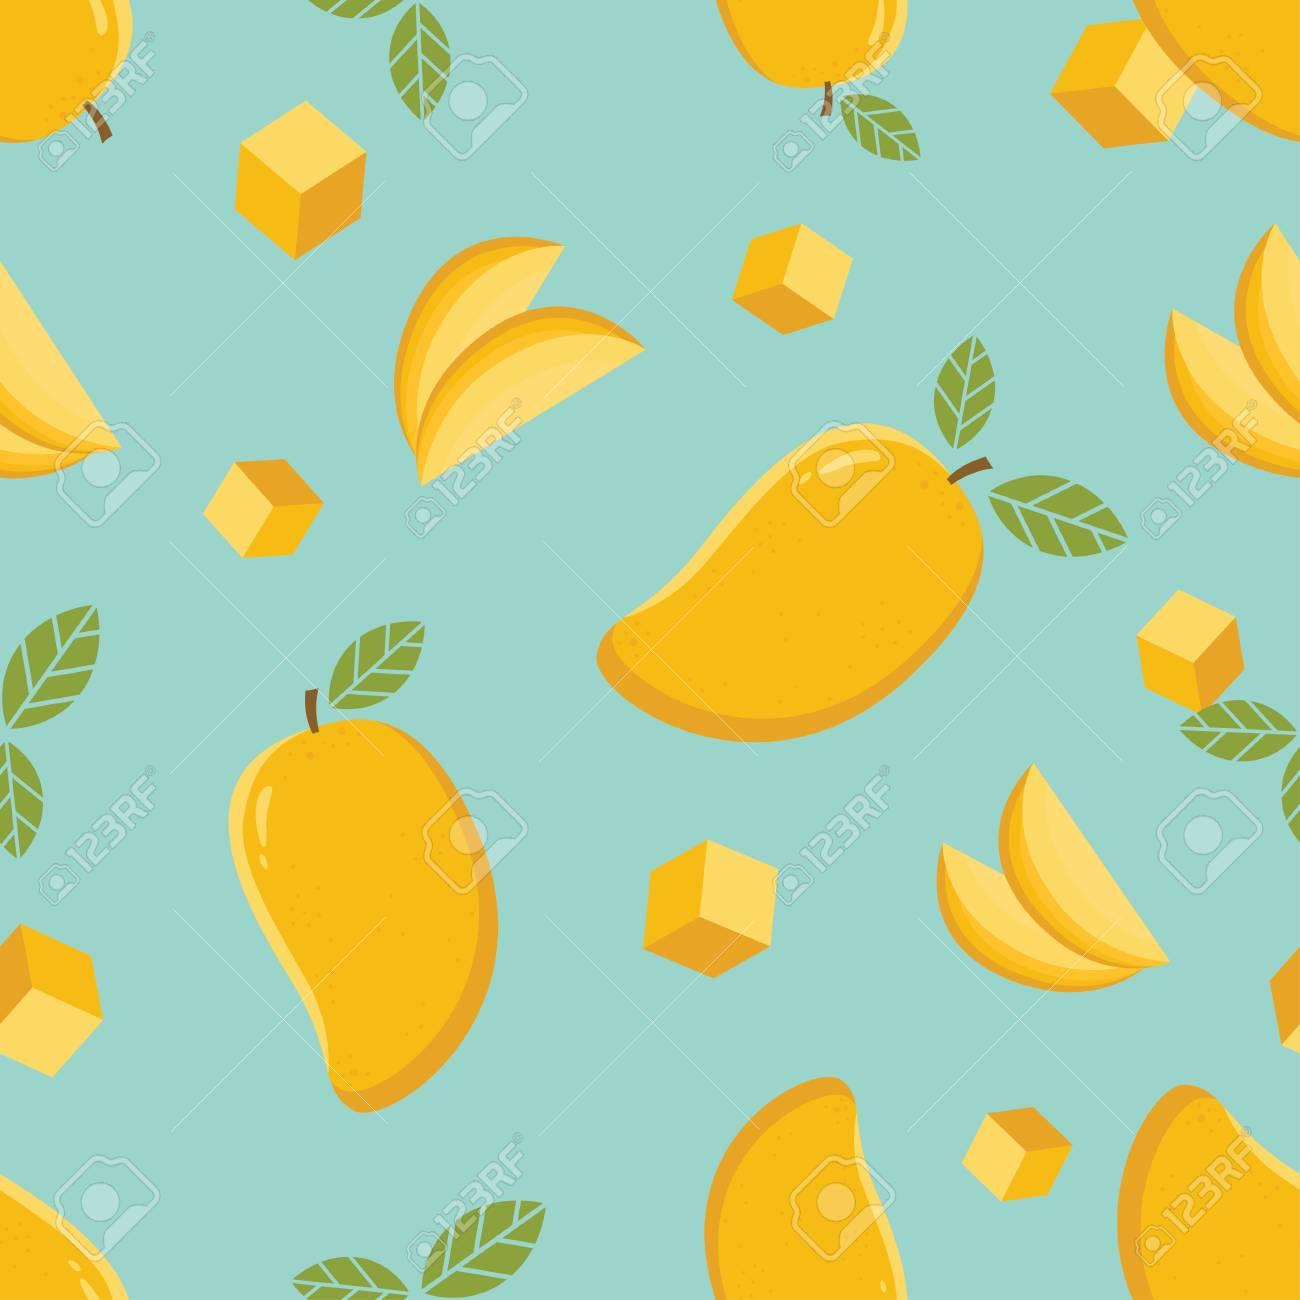 Mango Seamless Pattern Mango Seamless Pattern BackgroundMango 1300x1300